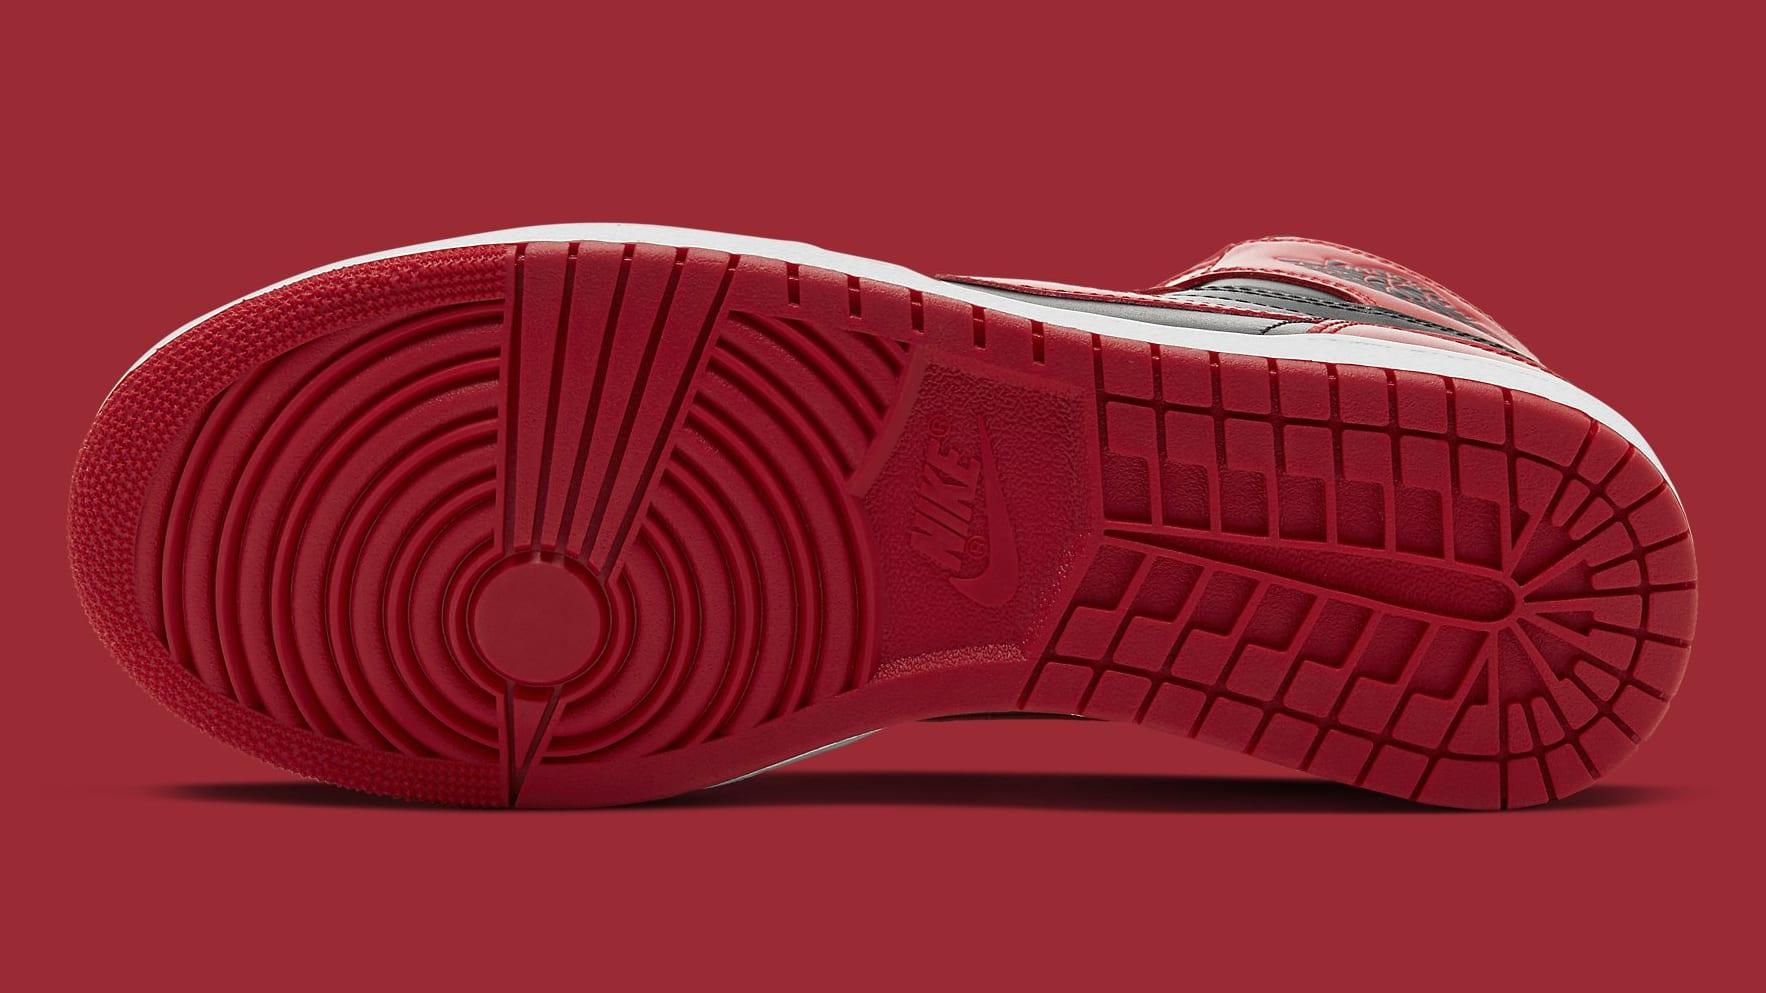 Air Jordan 1 High New Beginnings Varsity Red Release Date BQ4422-600 Sole